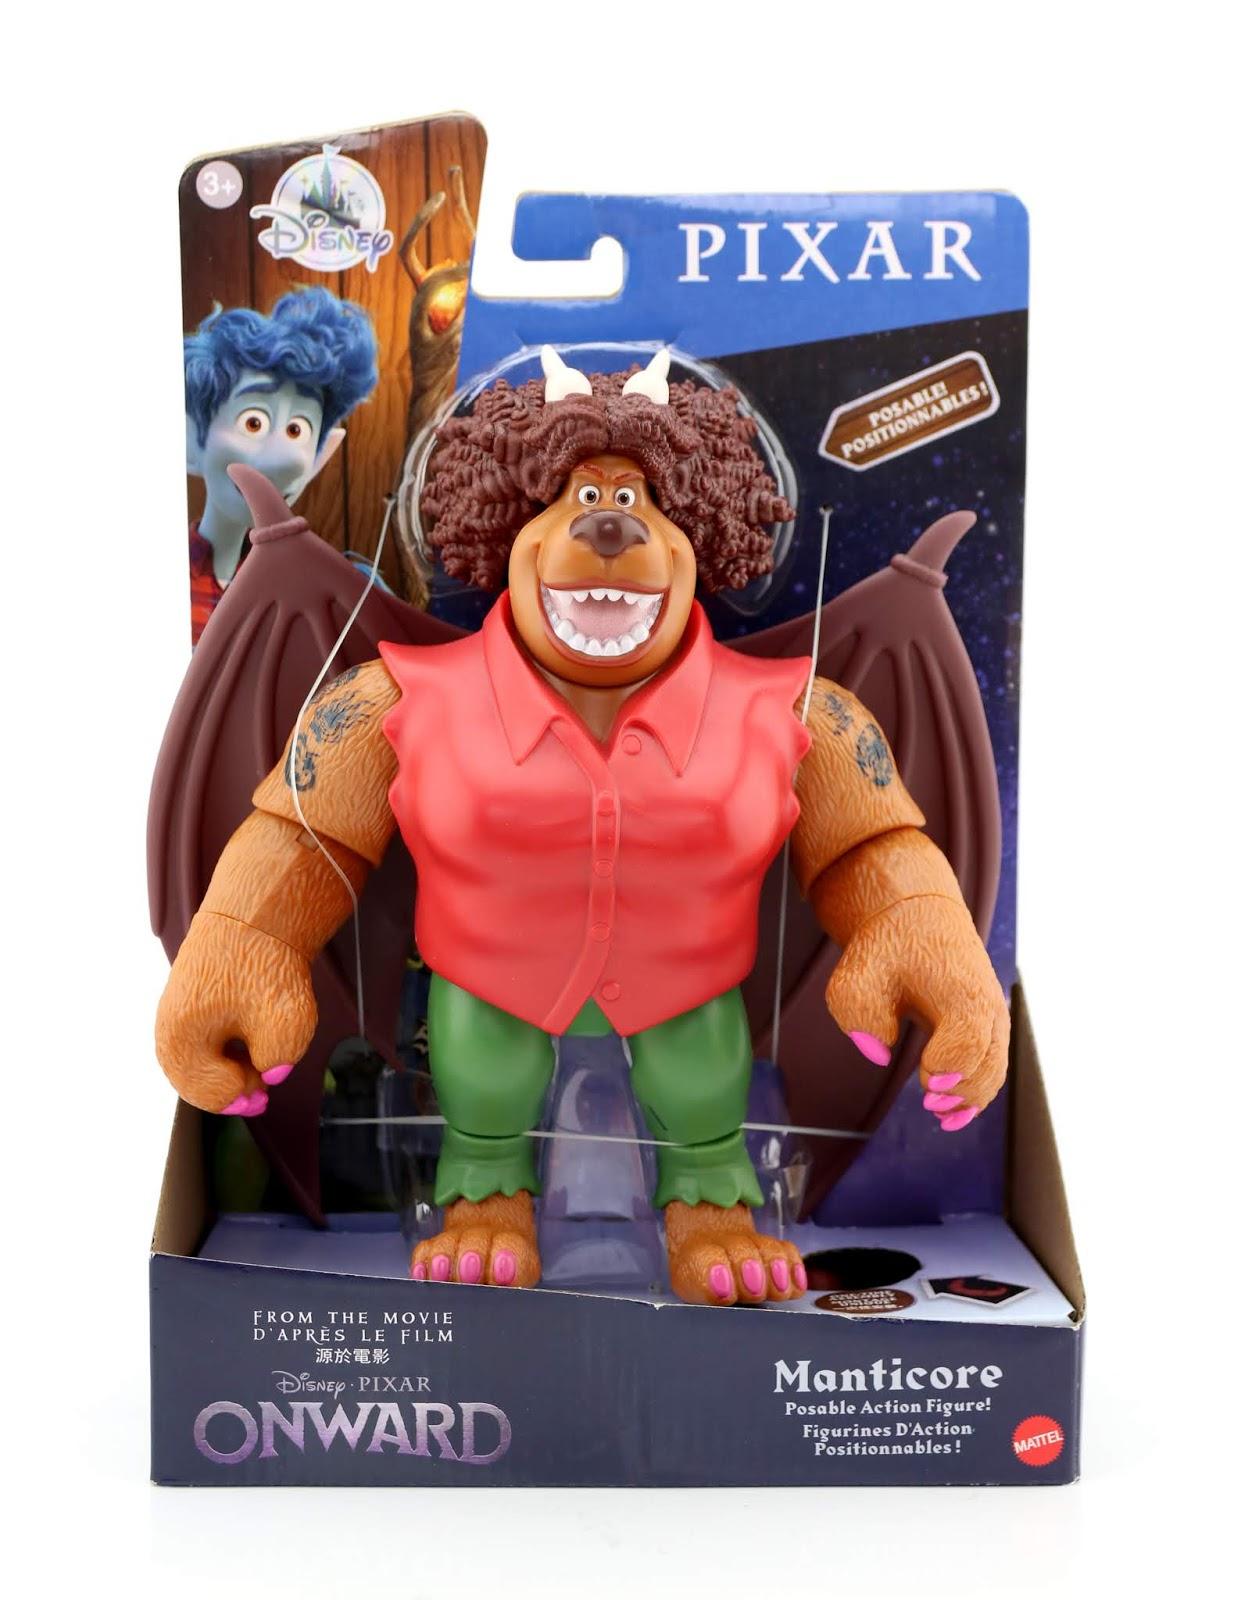 pixar onward action figures mattel manticore